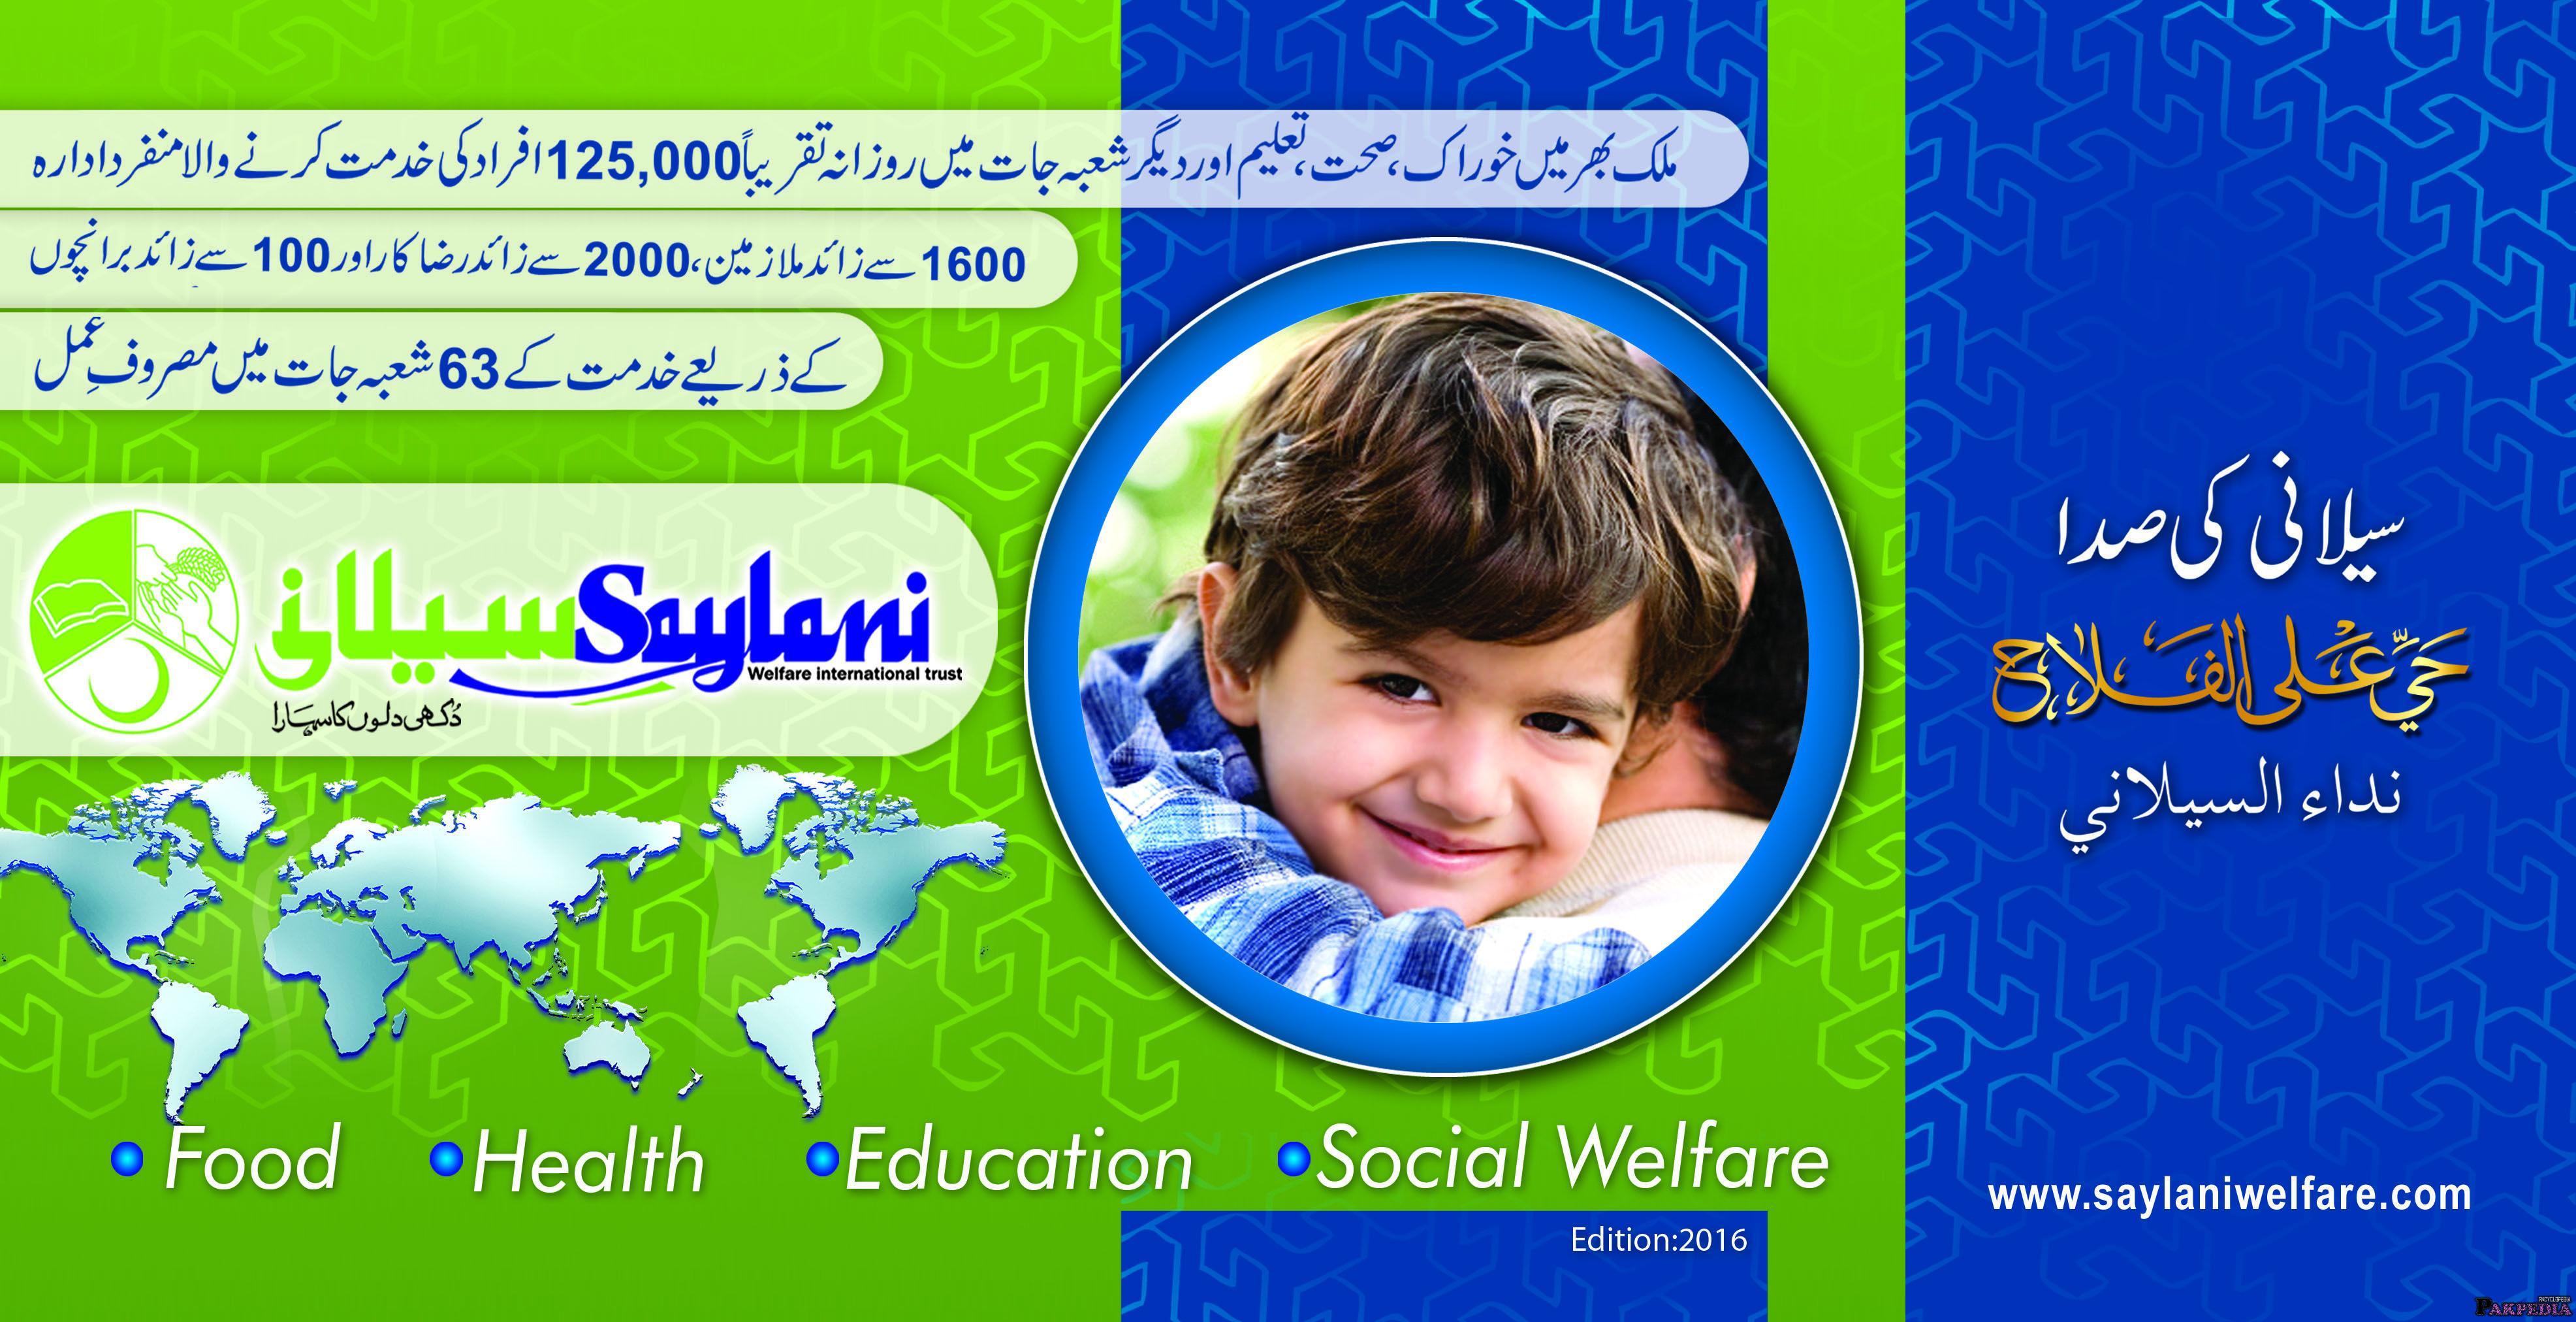 Saylani Welfare Trust is fully responsible